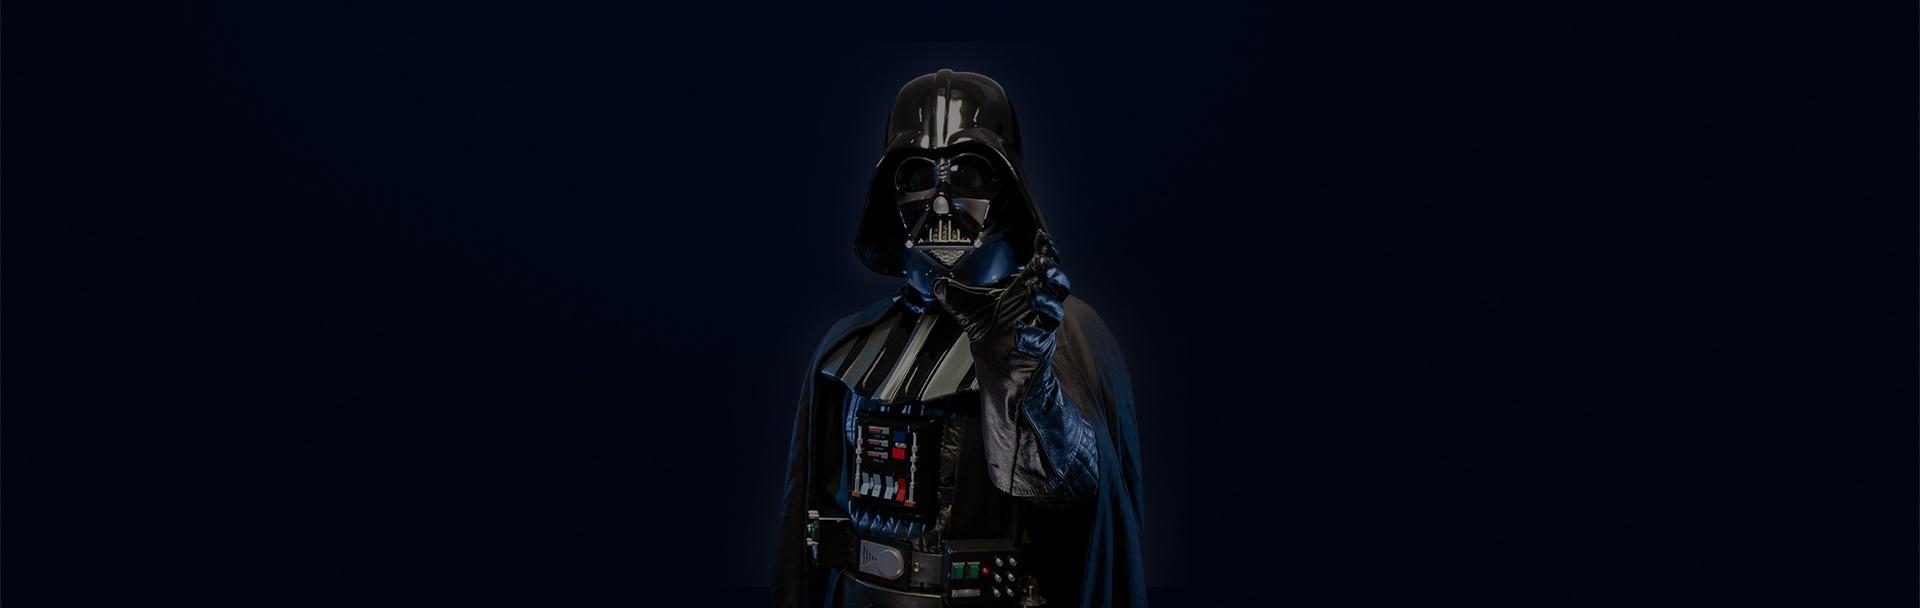 solucionweb-banner-blog-come-to-the-dark-frinday-black.jpg